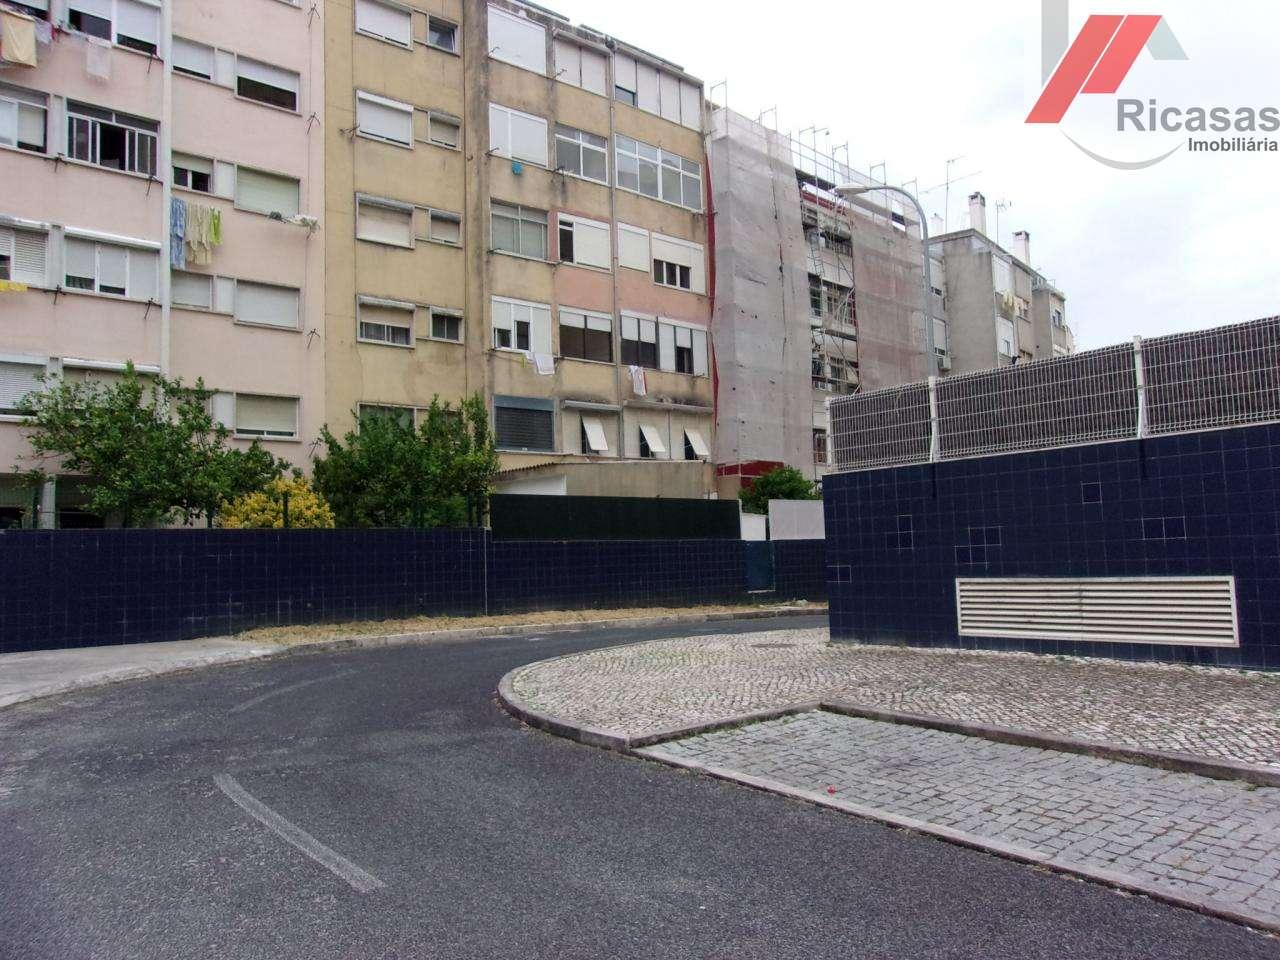 Apartamento para comprar, Marvila, Lisboa - Foto 37